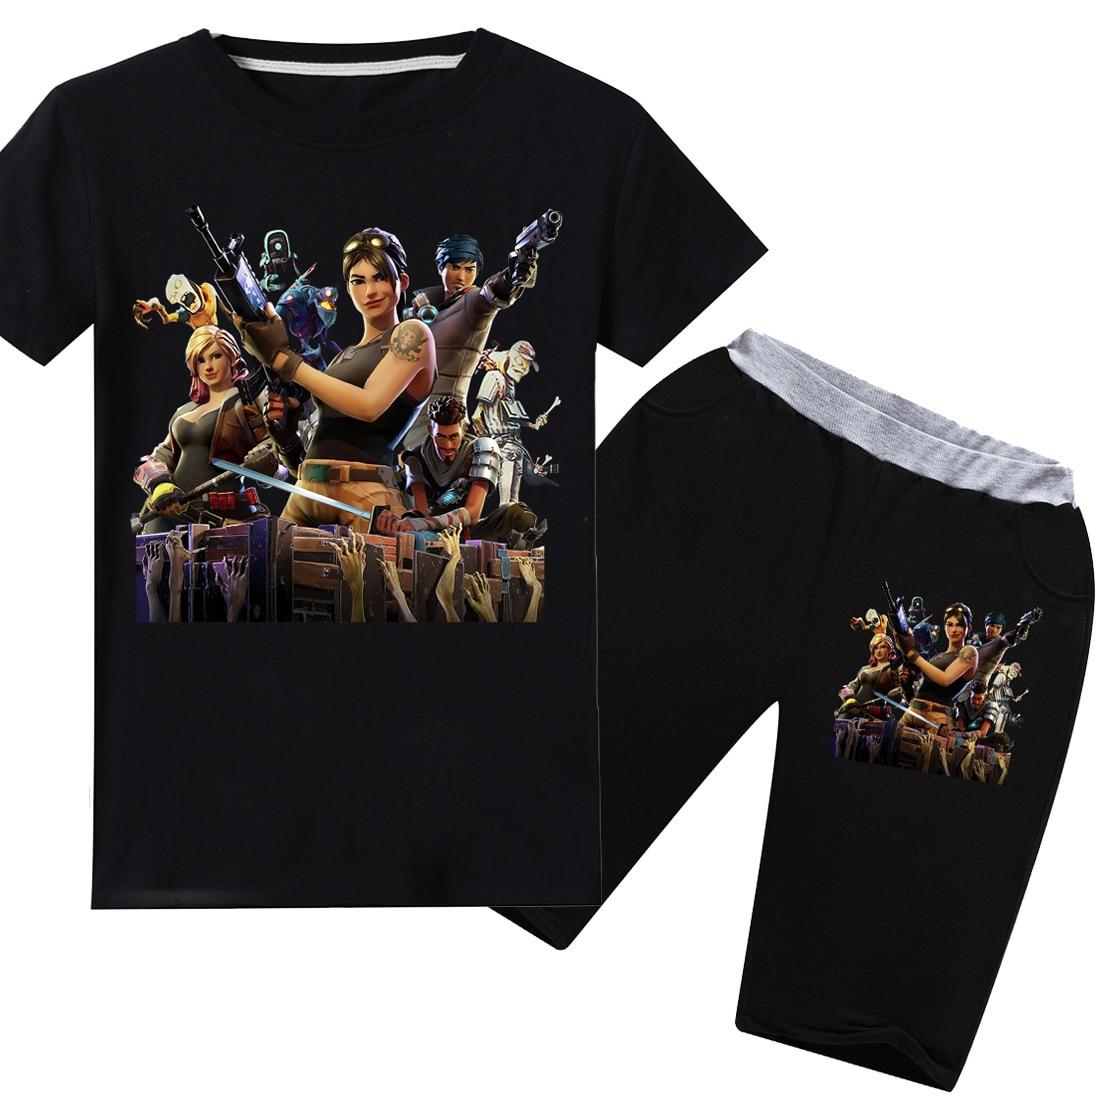 KüHn 6-14 Jahre Alte Kinder Kleidung Fortnight Anzug Junge T-shirt Fornite 3d Druck + Hosen 2 Stücke Sommer Junge Kinder Kleidung Casual Hemd